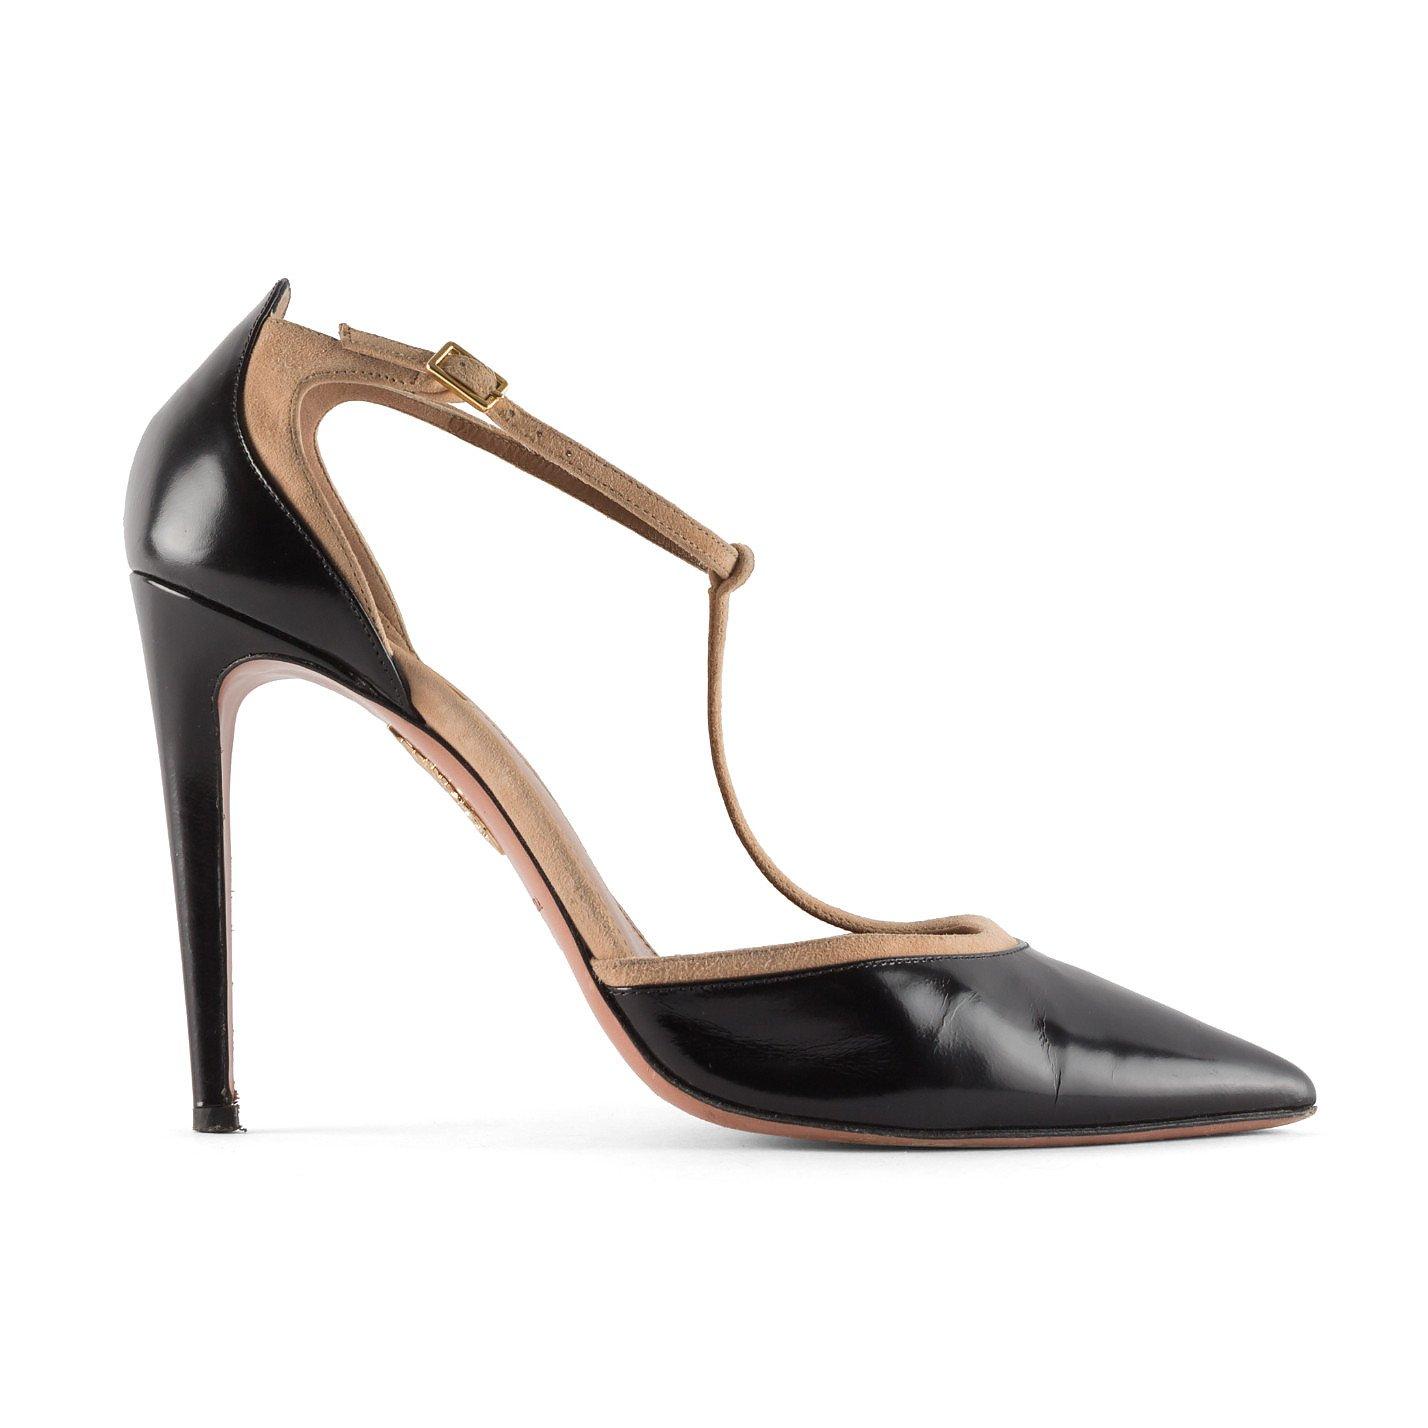 Aquazzura Leather Stiletto Heels